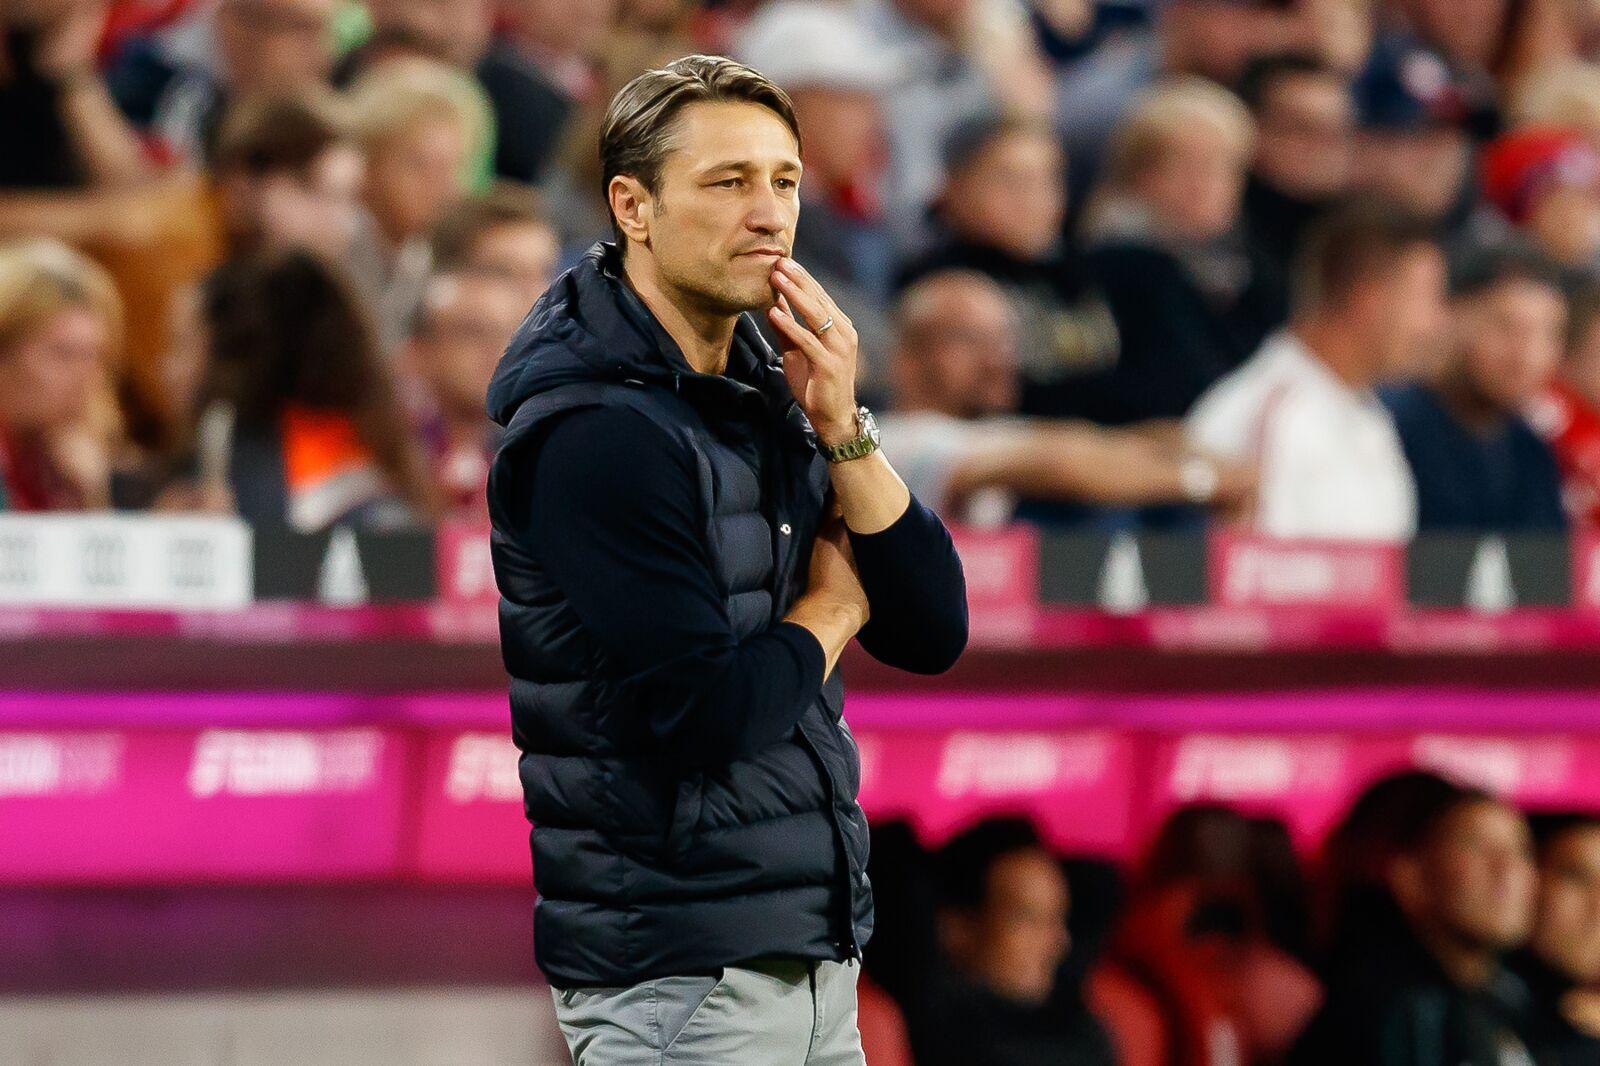 Bayern Munich coach Niko Kovac may have already lost his players' trust